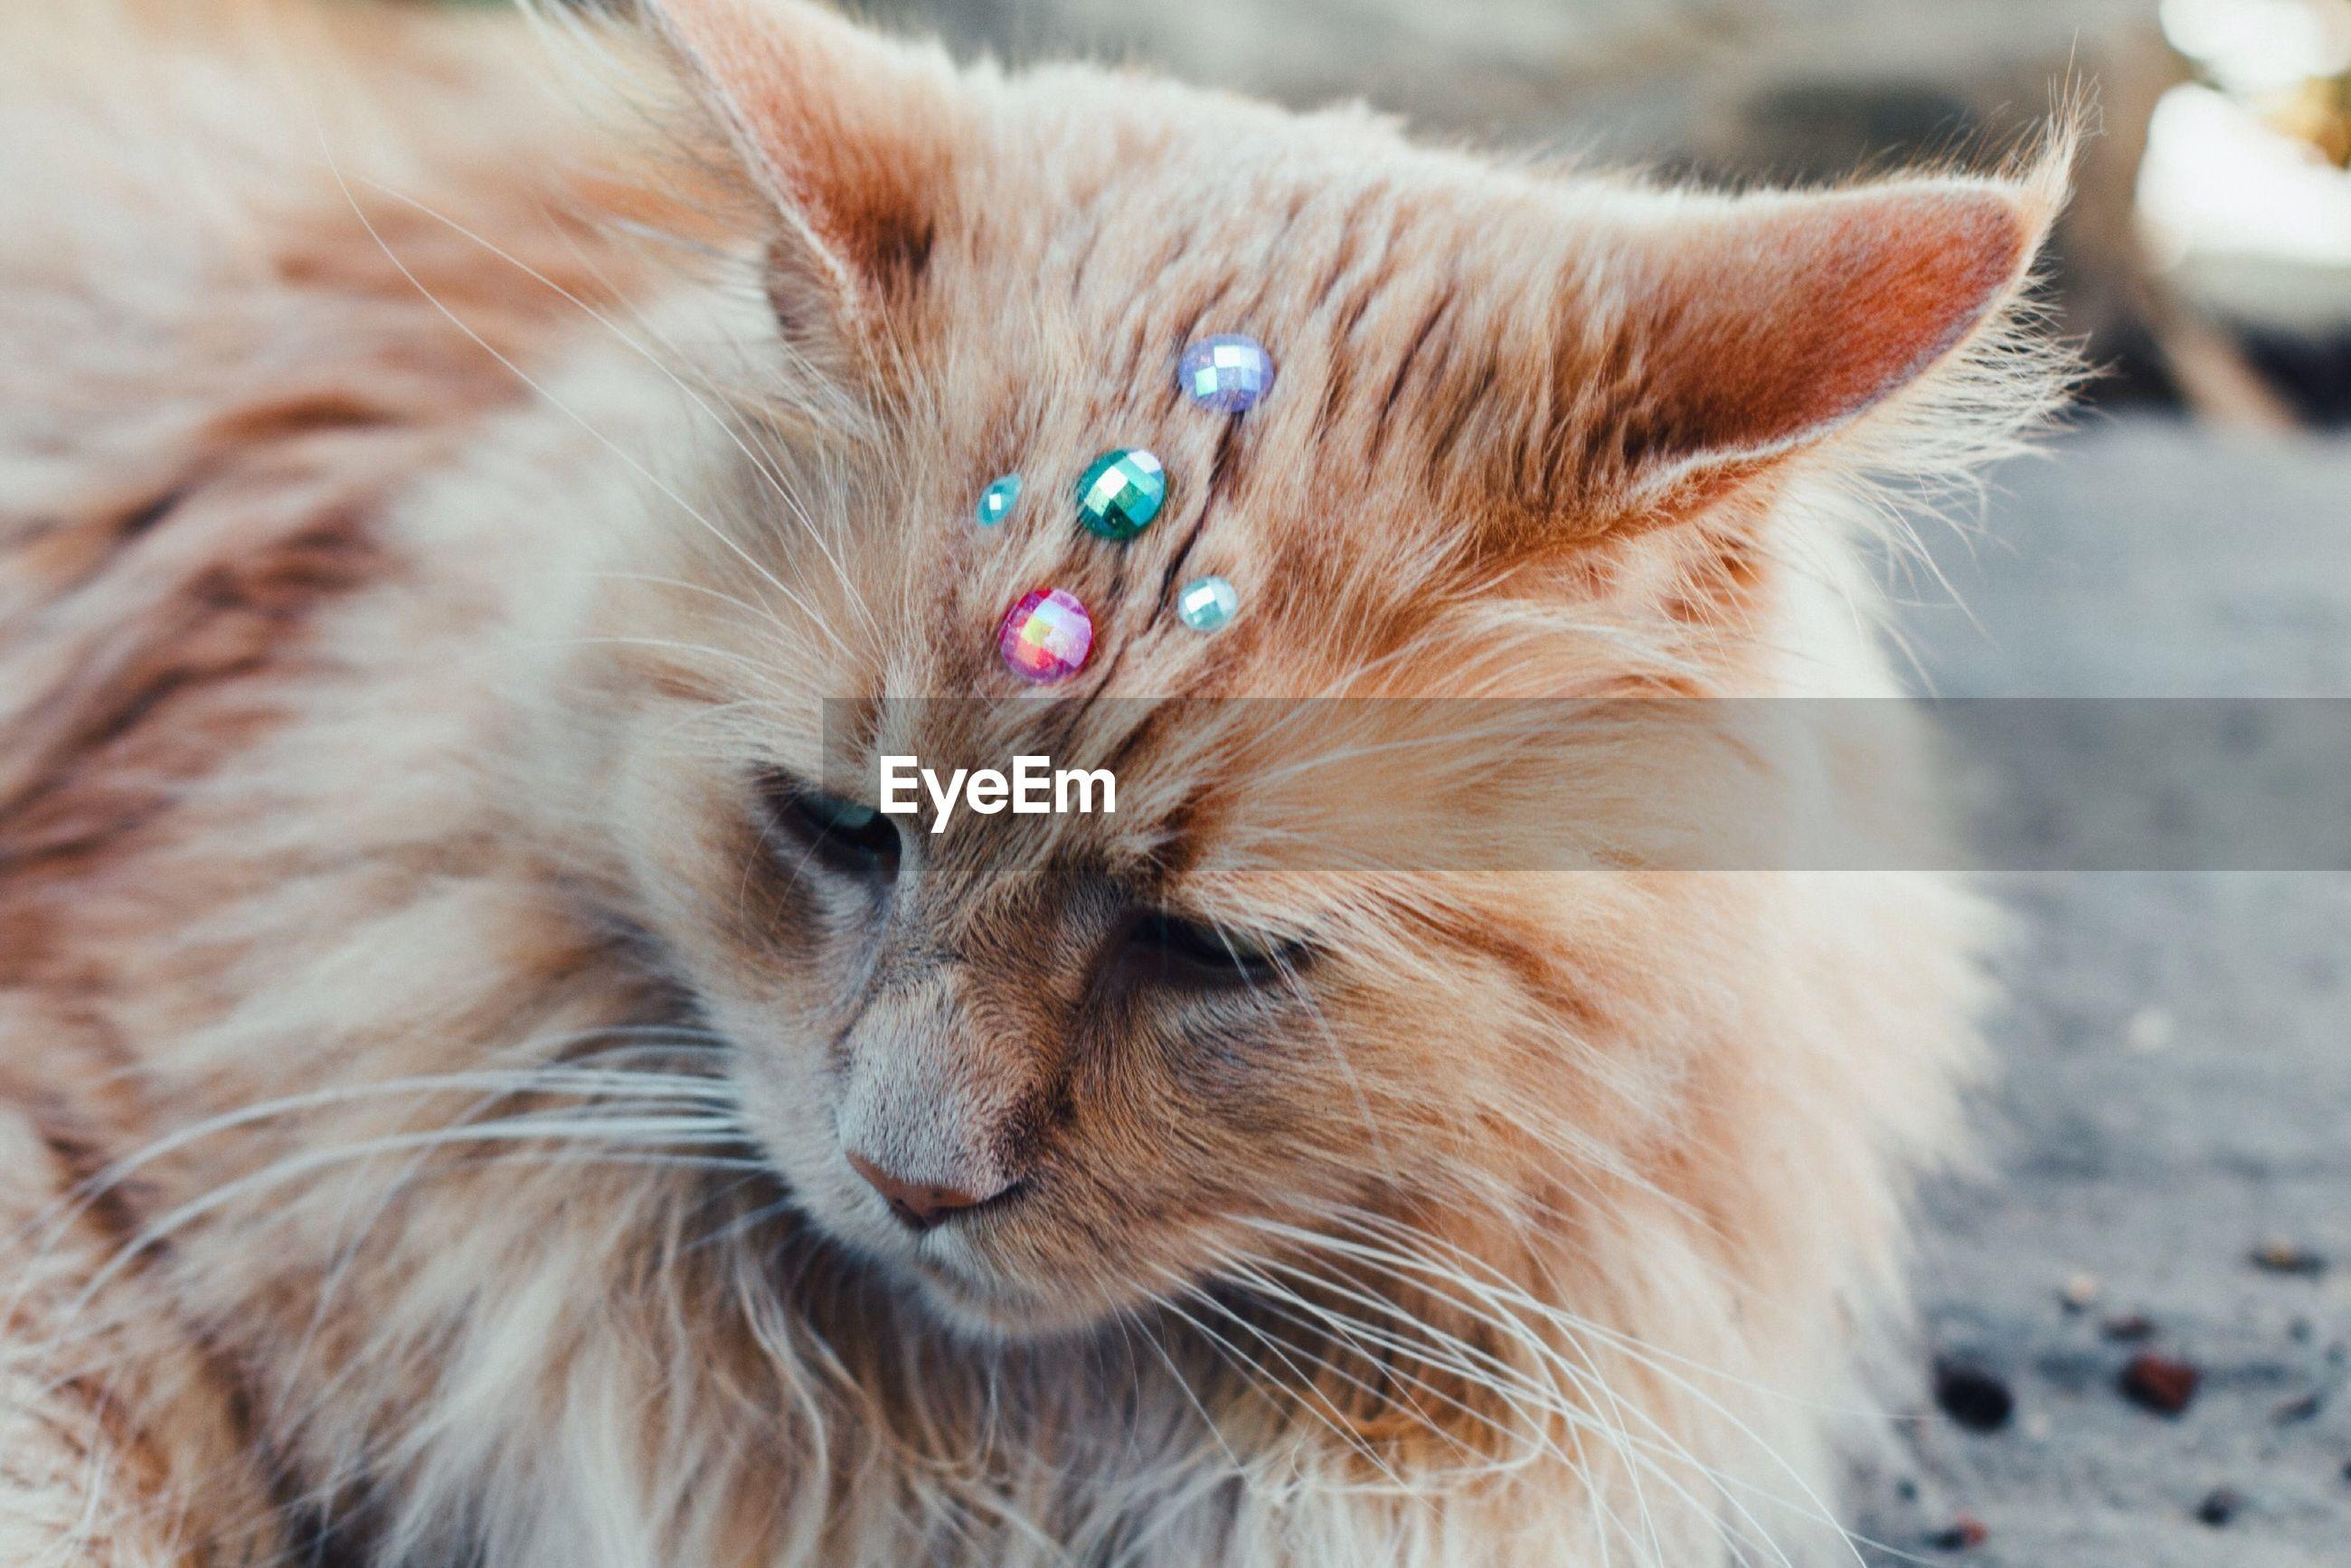 Close-up of cat with gemstones